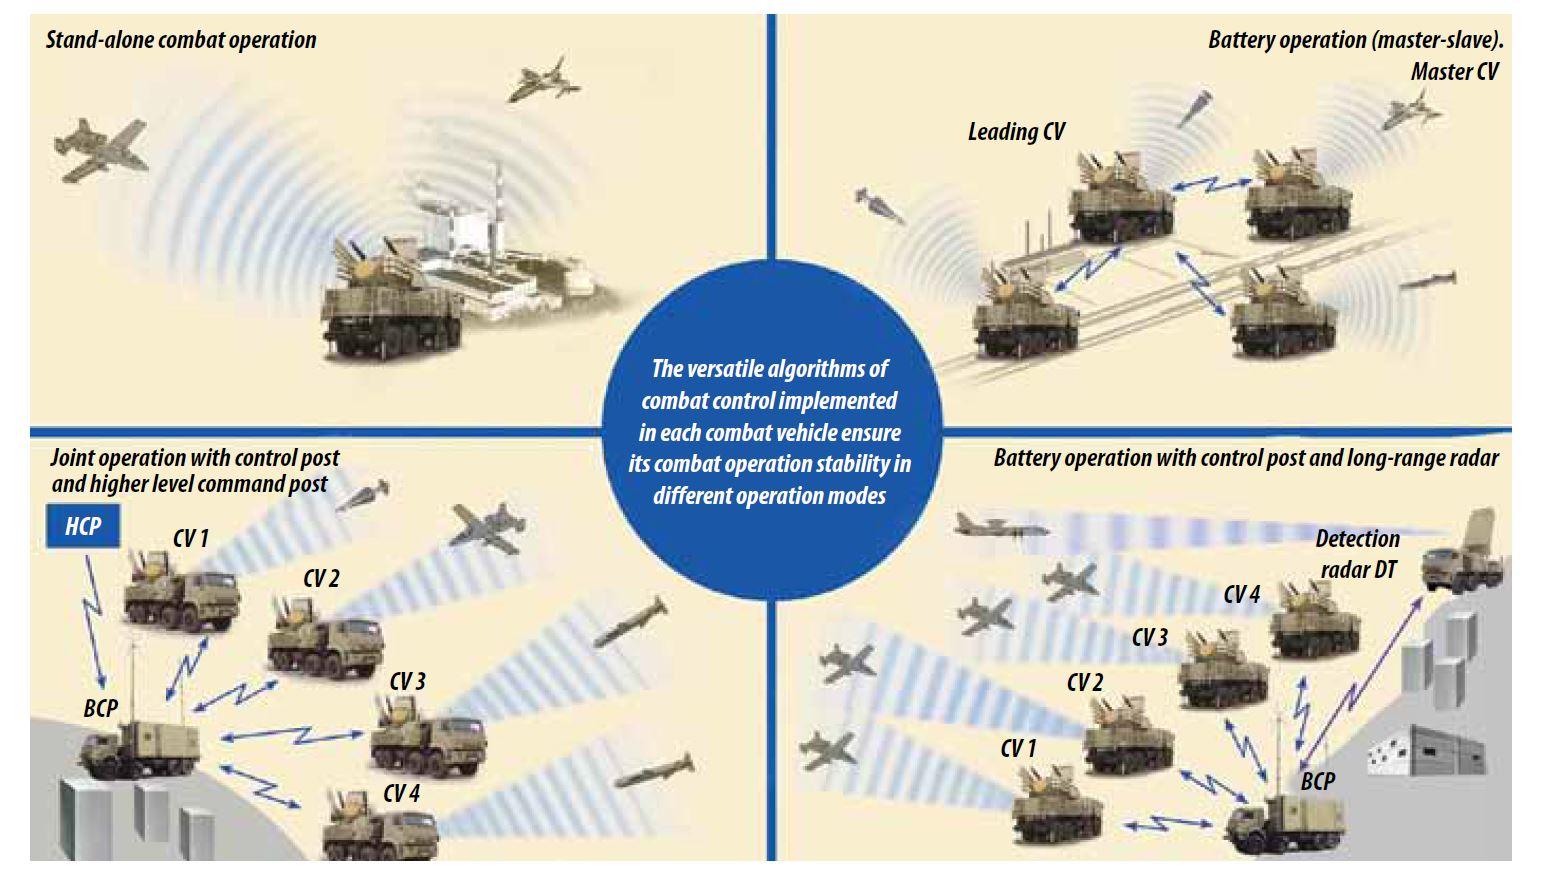 Pantsir missile/gun AD system Thread: #2 - Page 8 EWYwaq4WsAMLZ8s?format=jpg&name=large